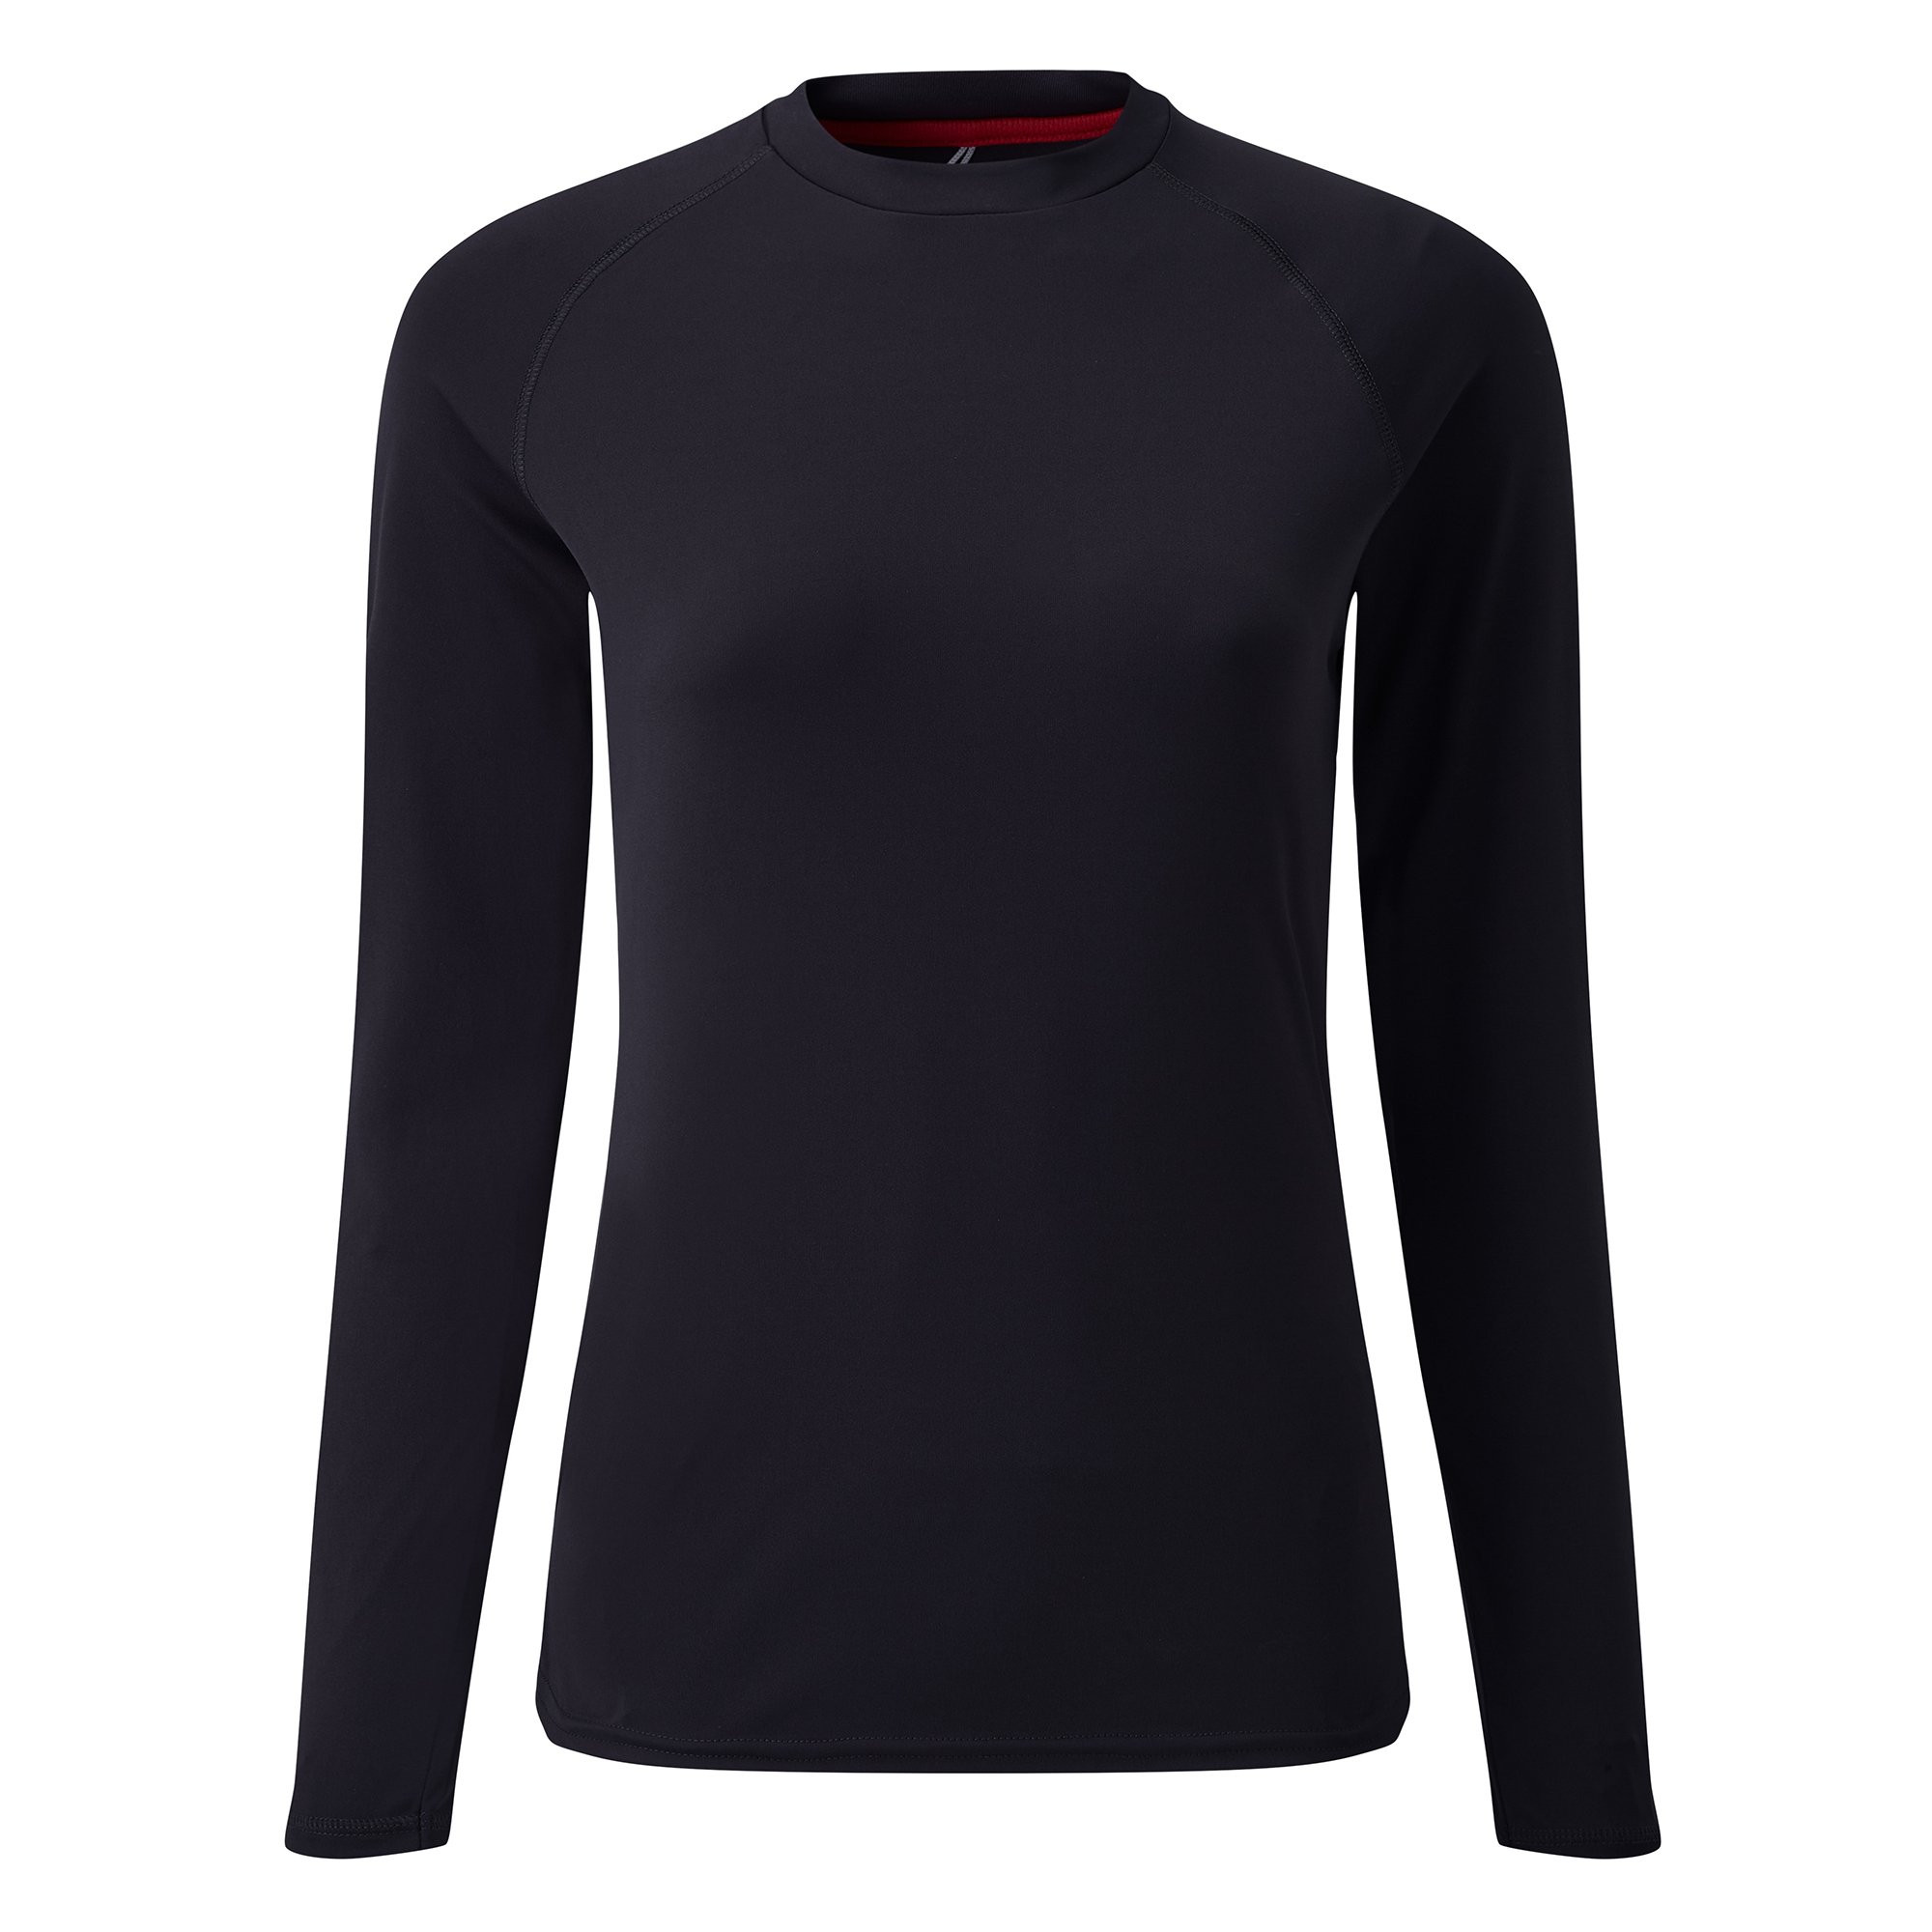 Women's UV Tec Tee - Long Sleeve - UV011W-NAV06-1.jpg